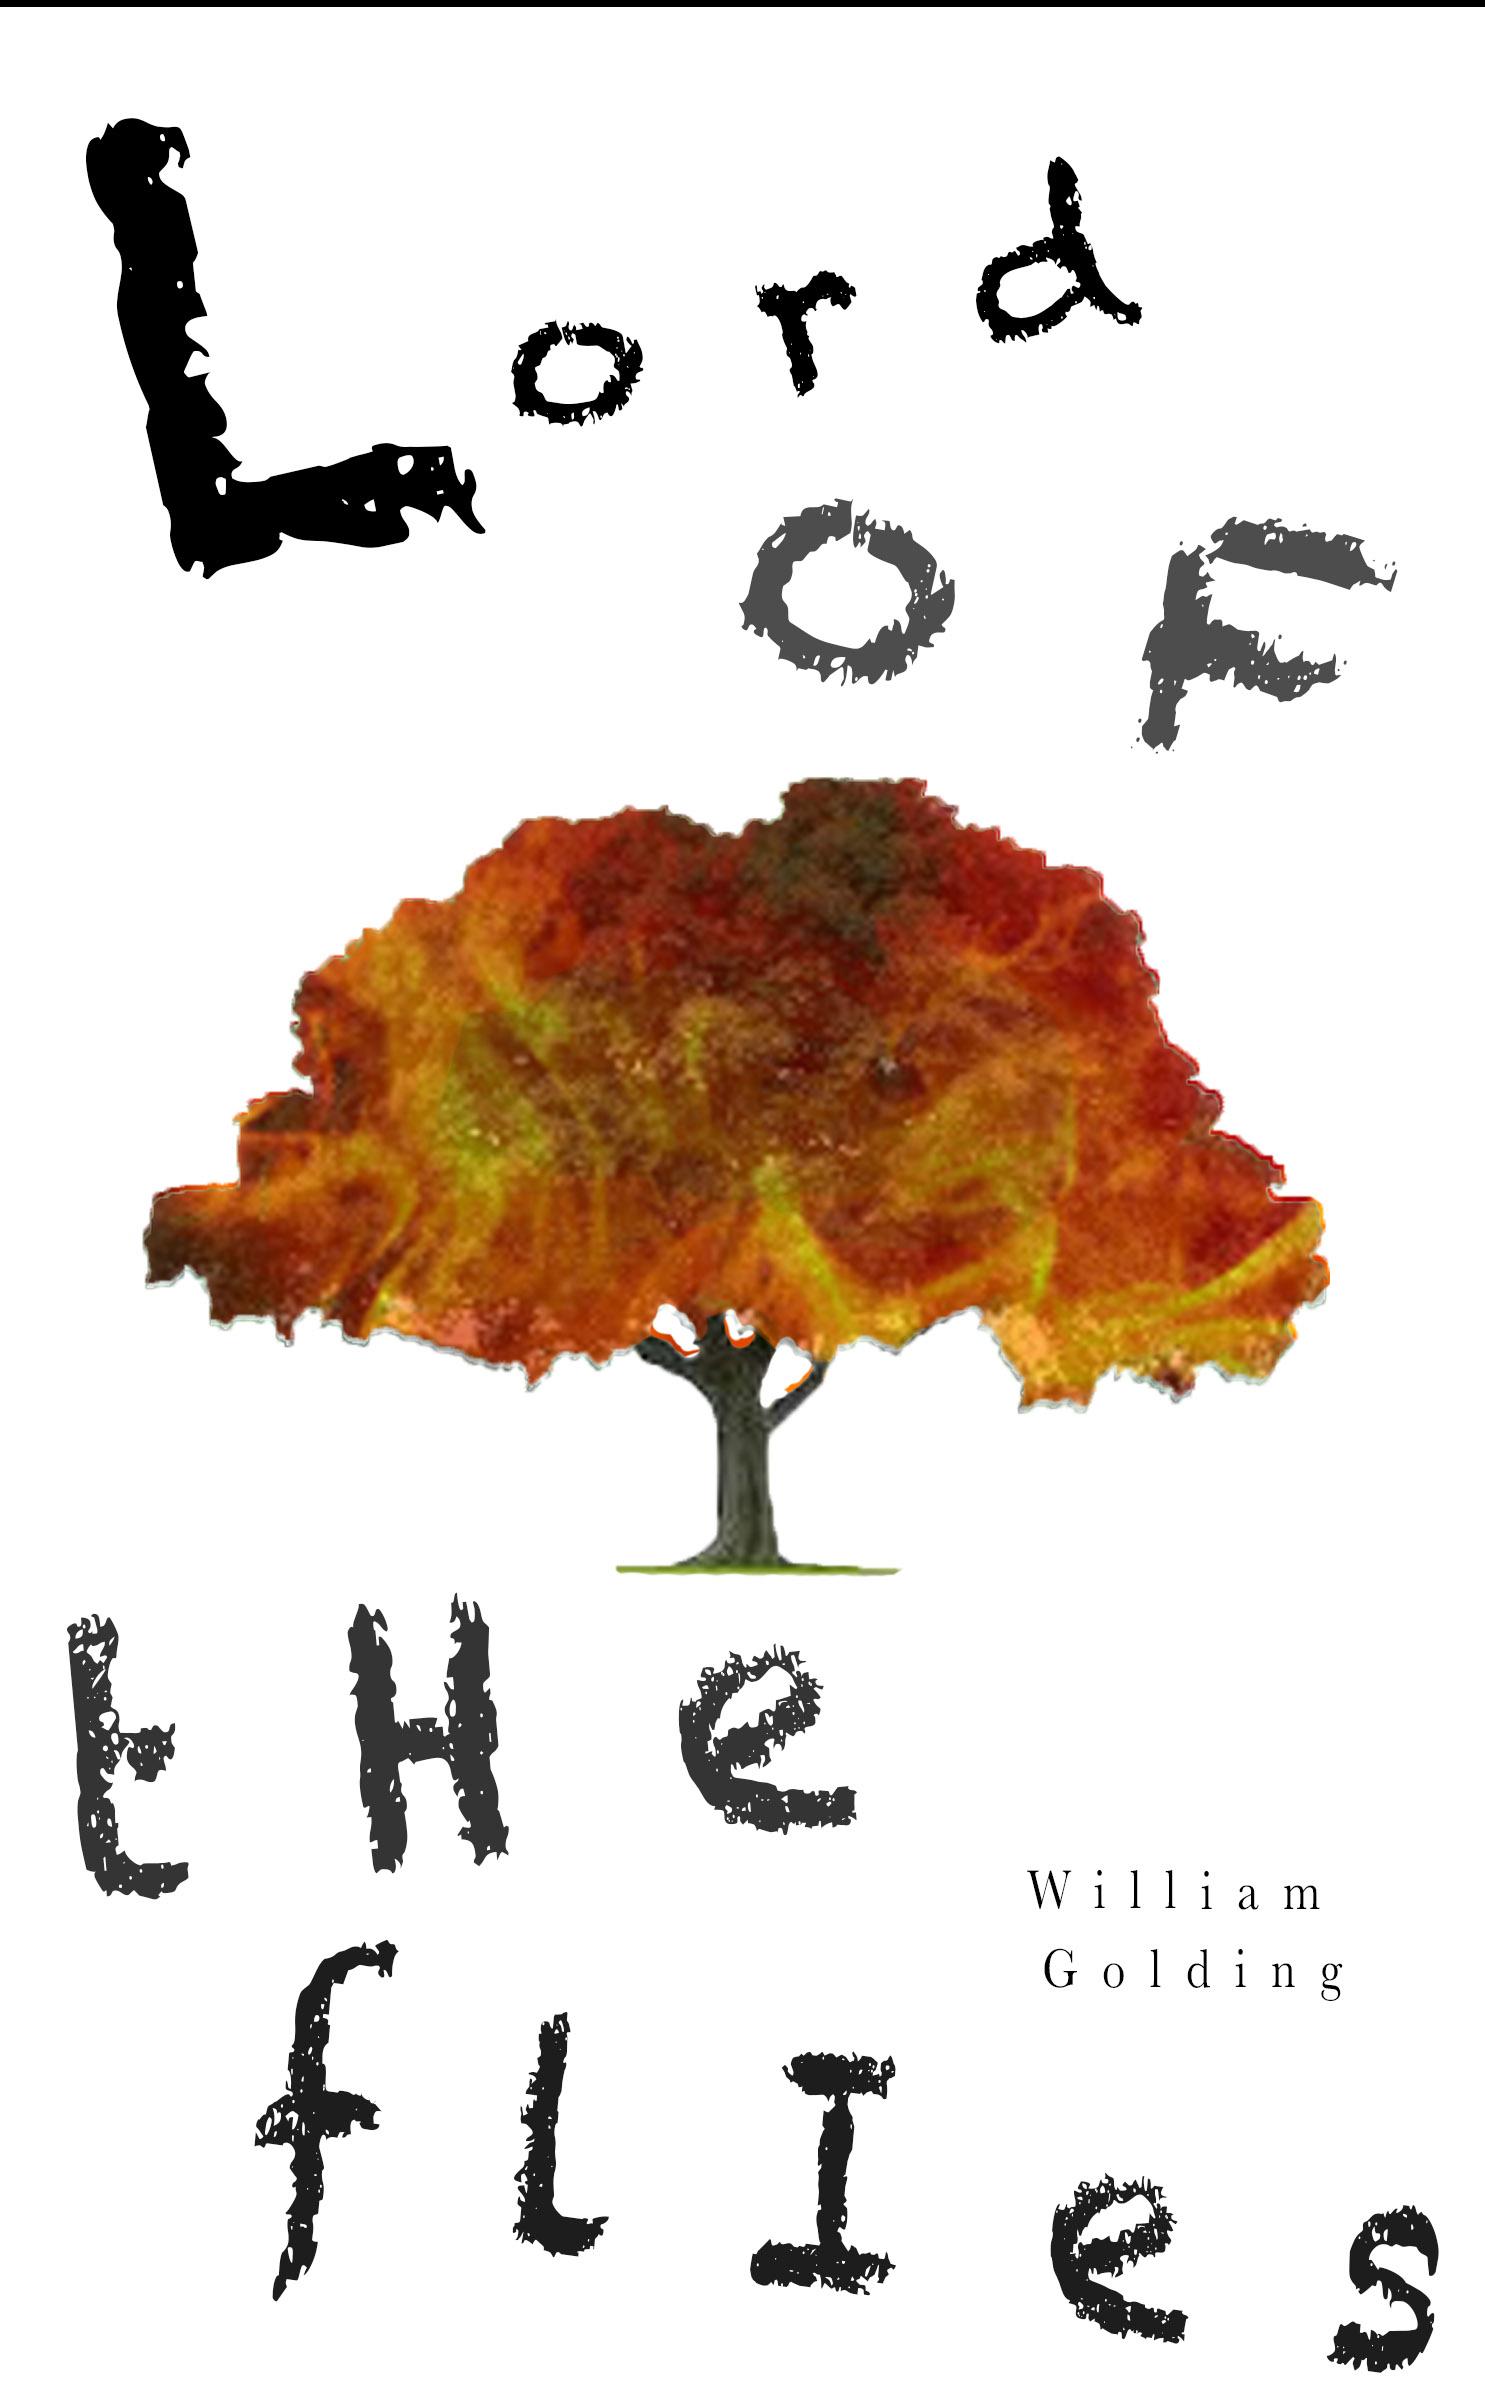 Roylance, Joshua. Book cover